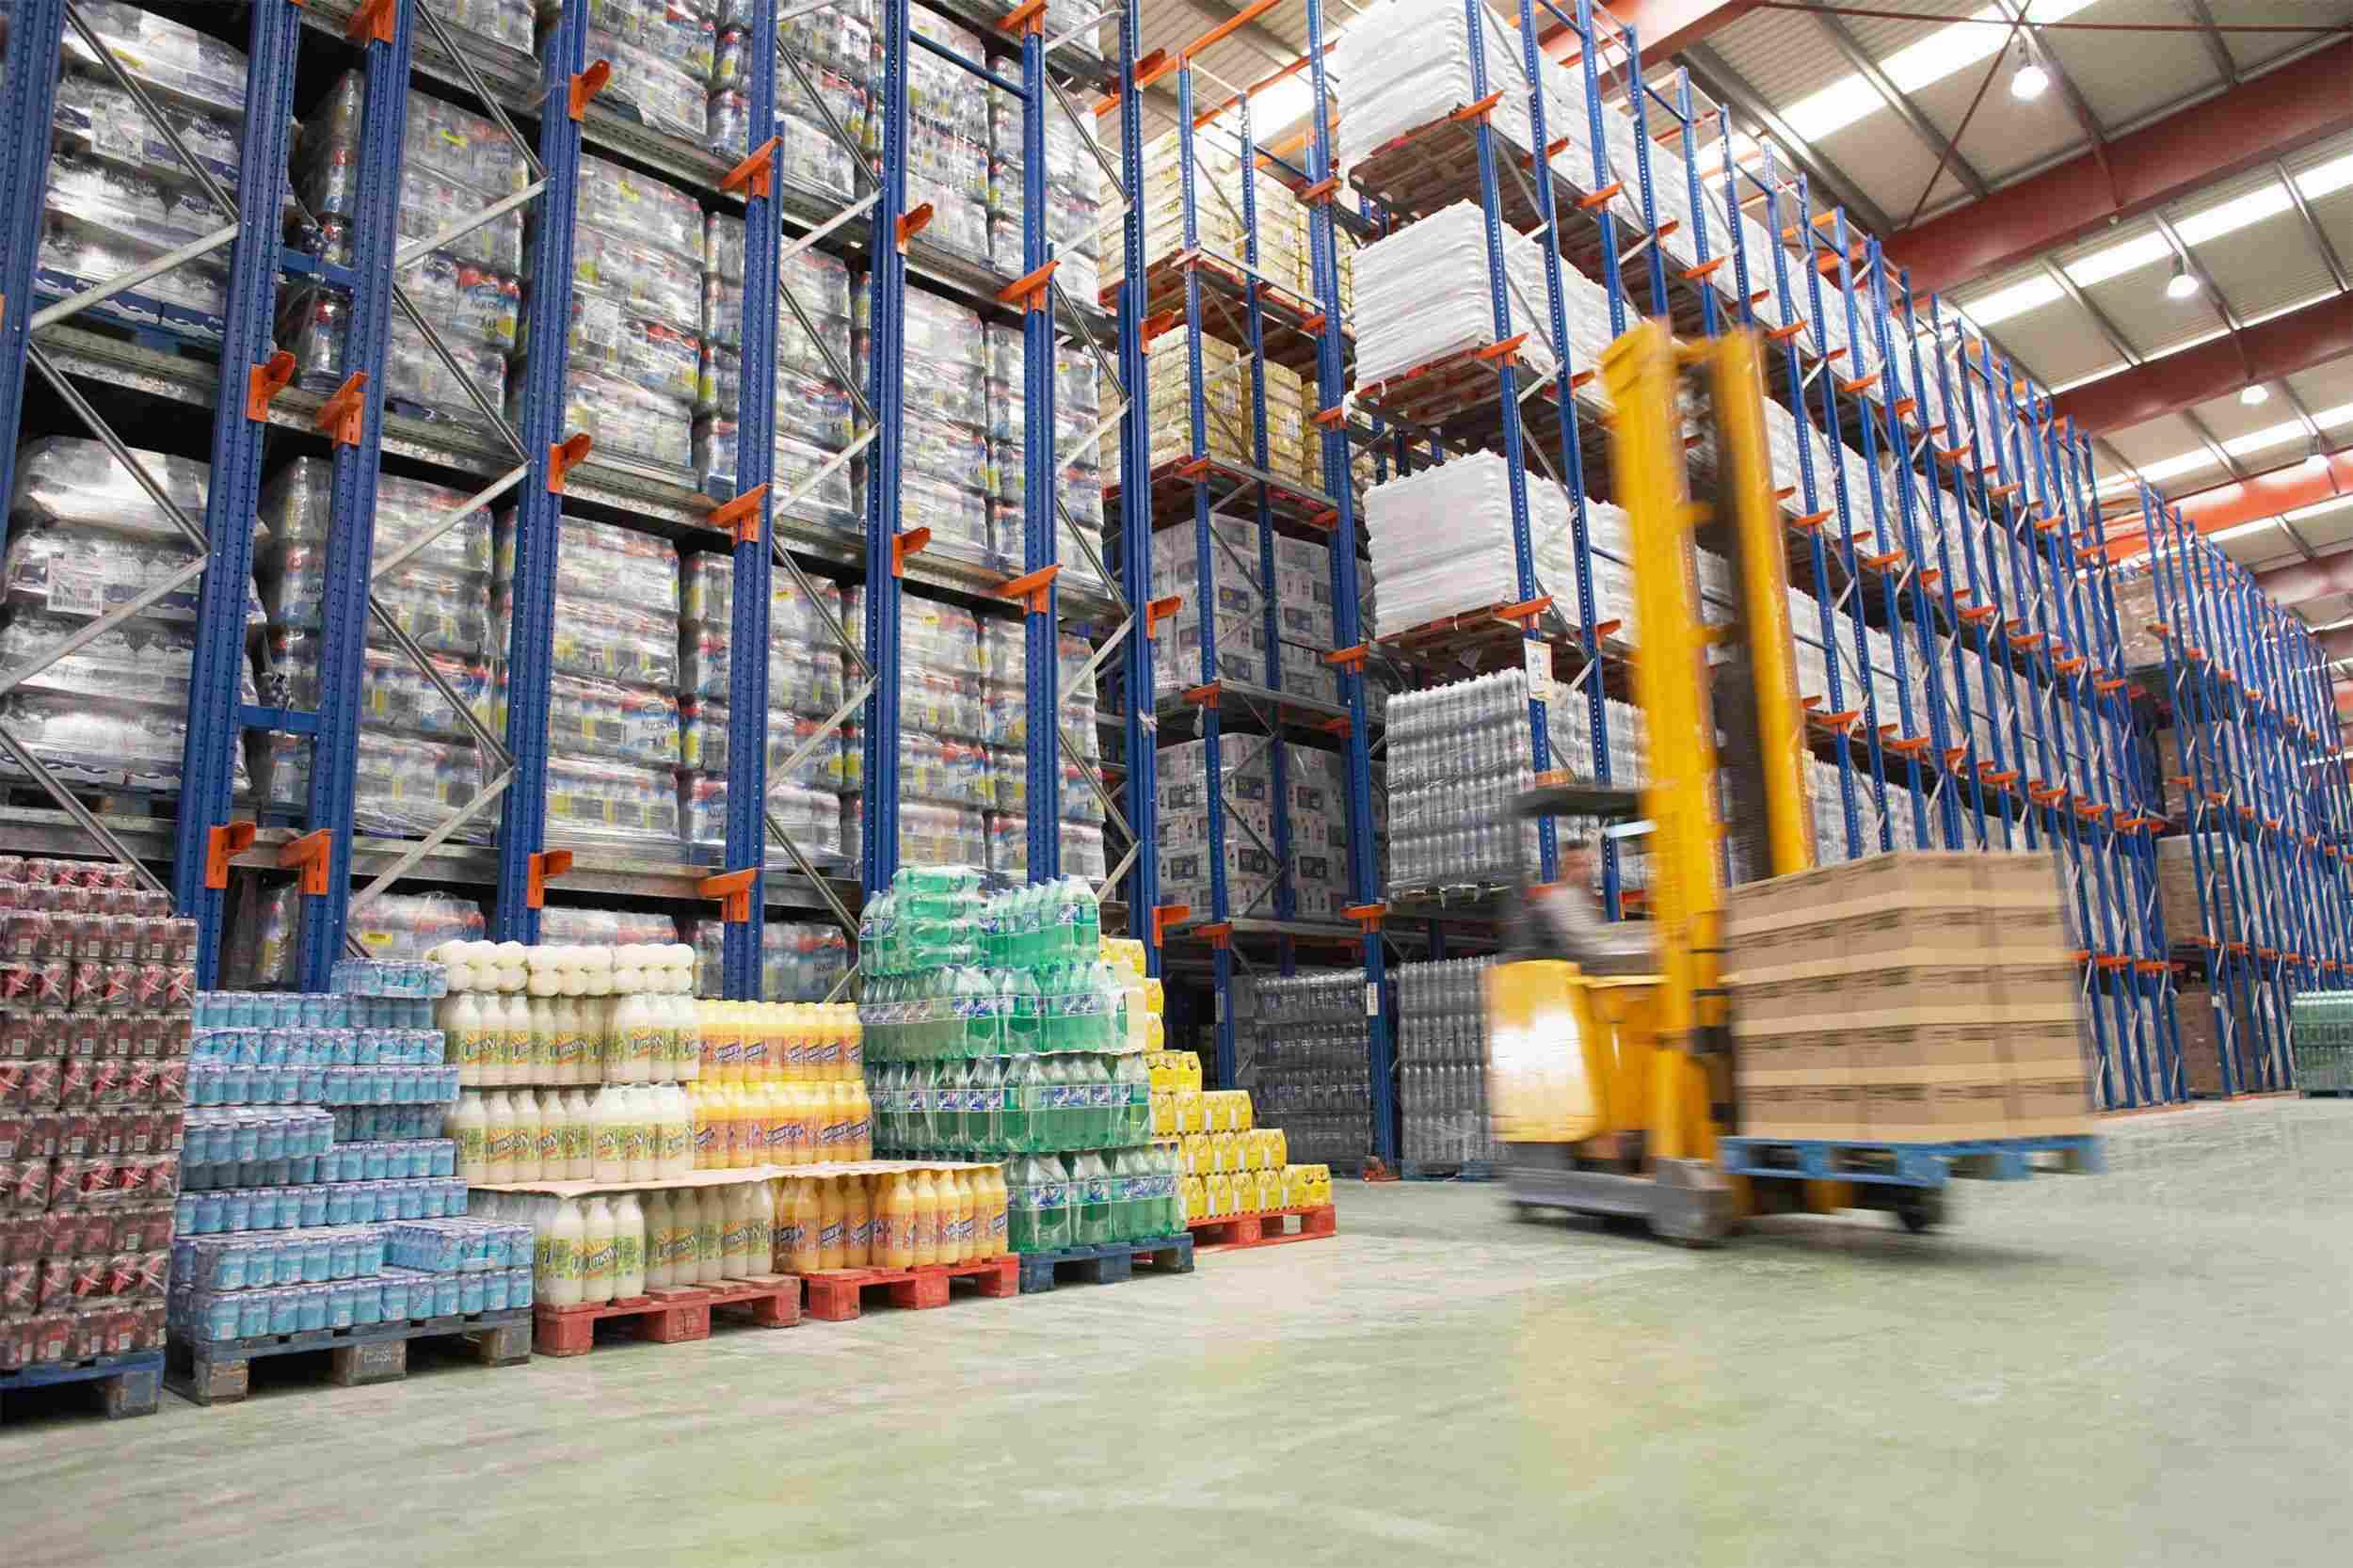 http://bhartiyalogistics.com/wp-content/uploads/2015/09/Warehouse-and-lifter-1.jpg